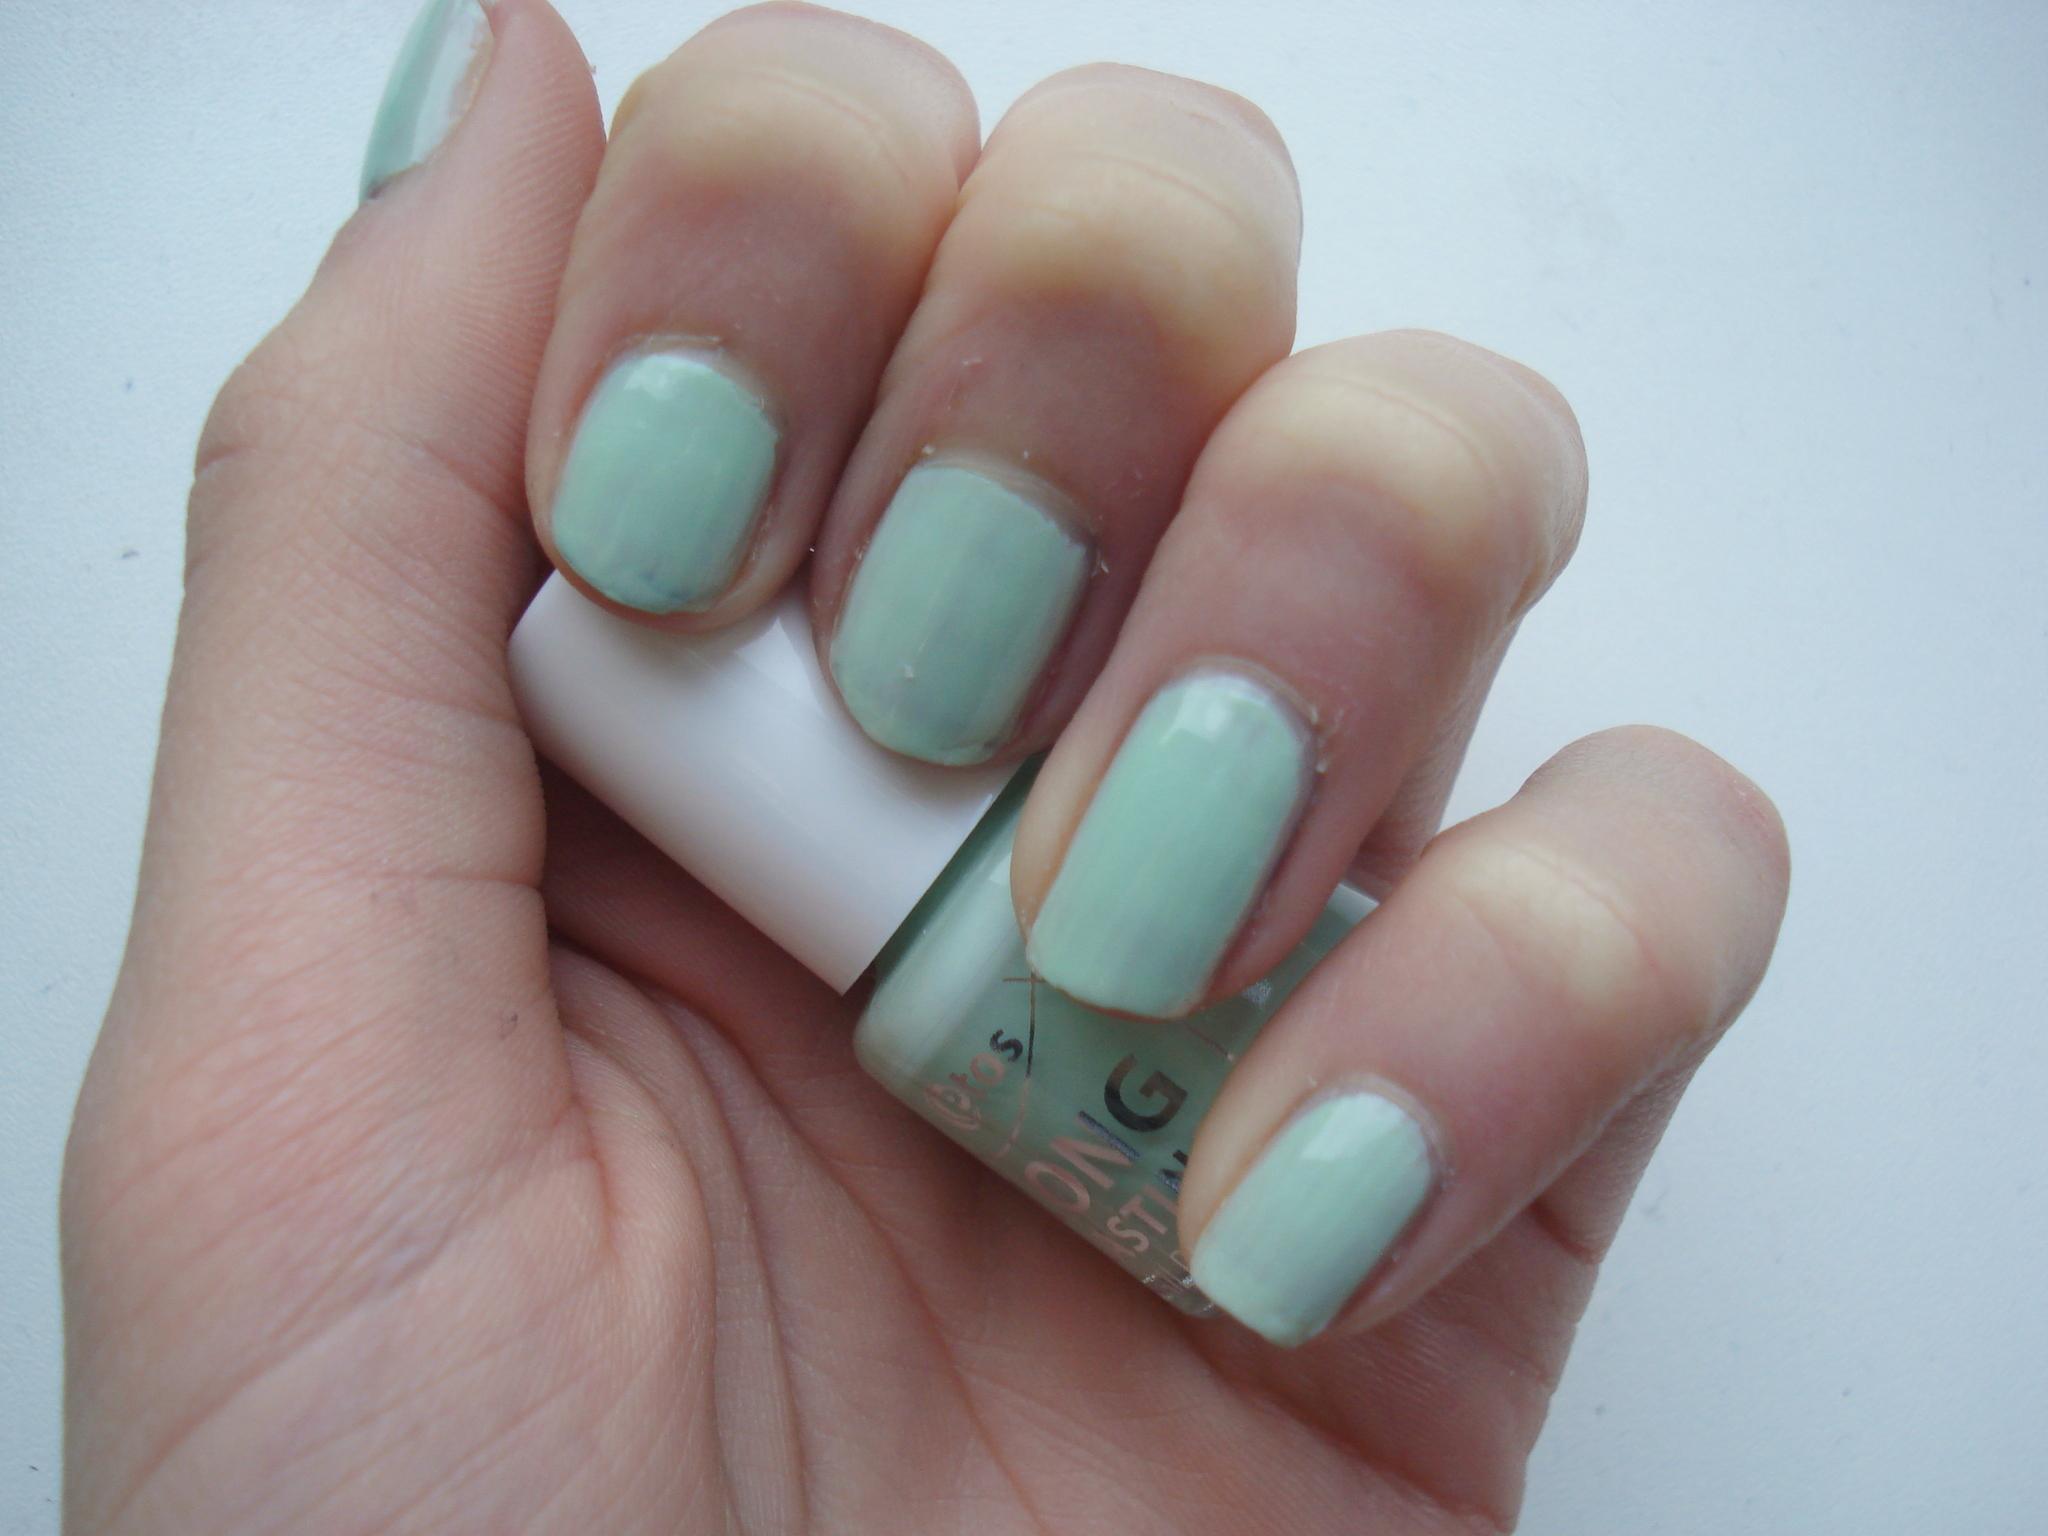 goede kwaliteit van nagels